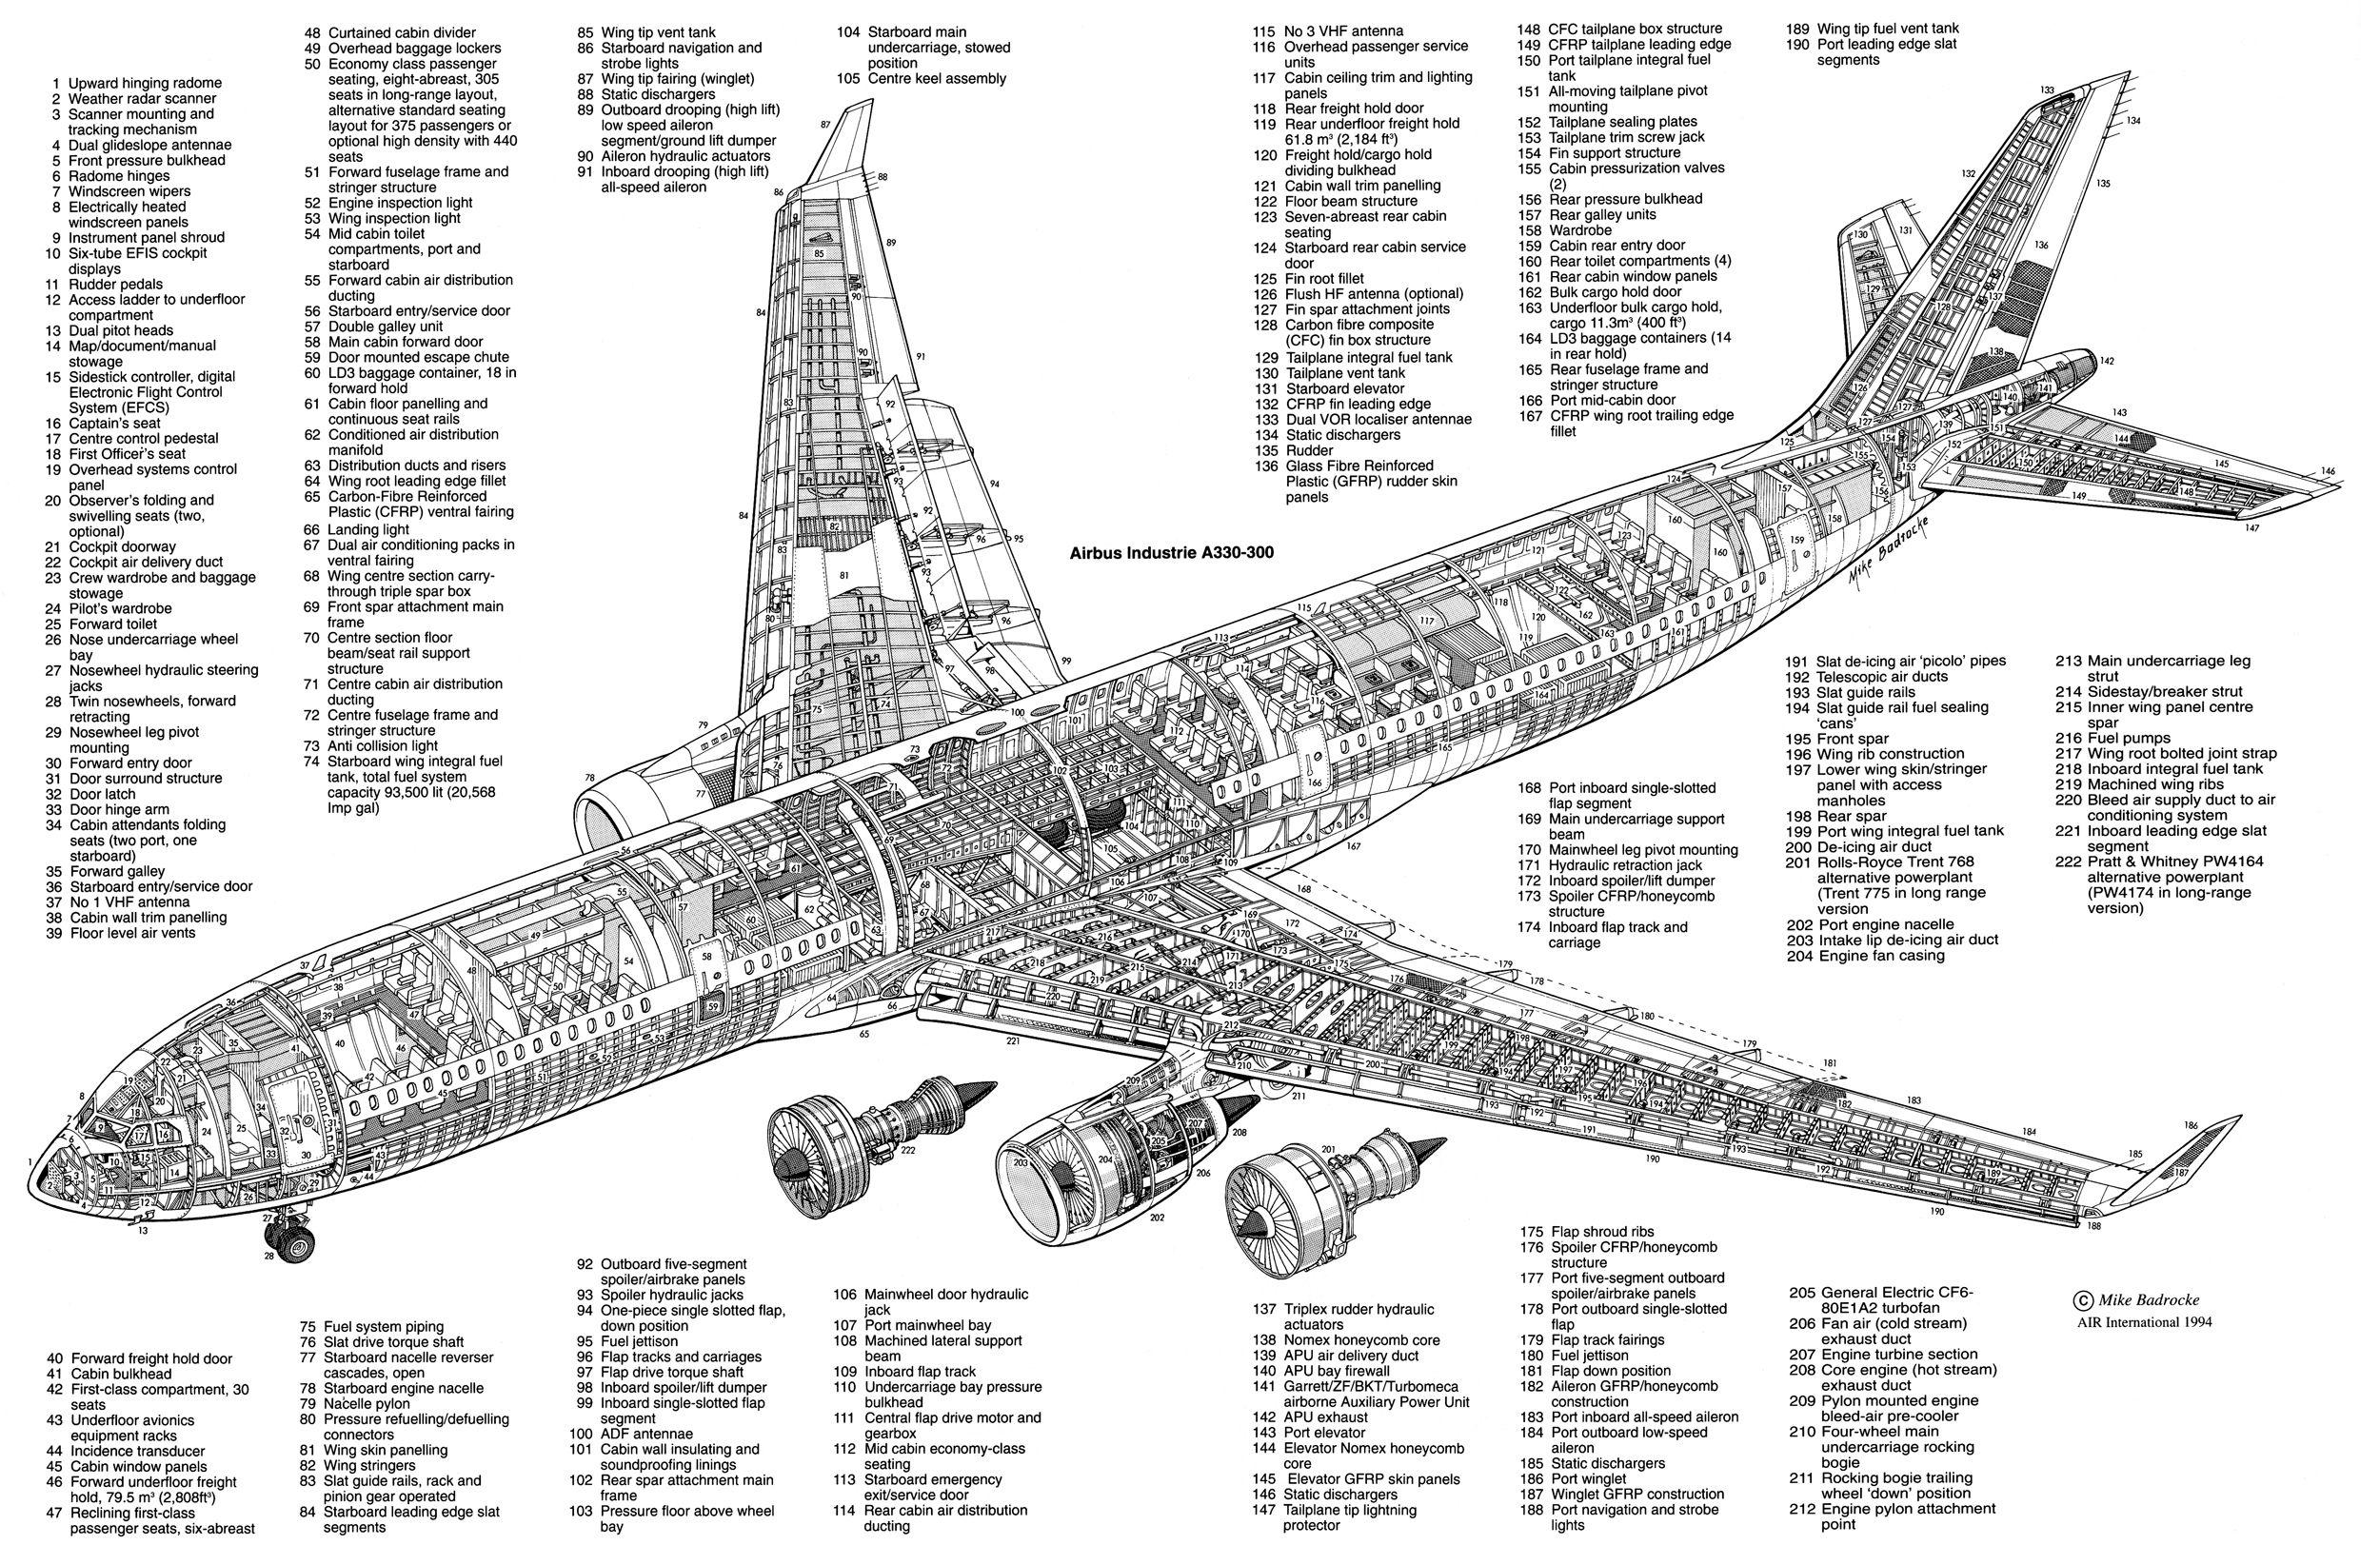 F 15 E Strike Eagle Cutaways Ed Forums Aero Modelos